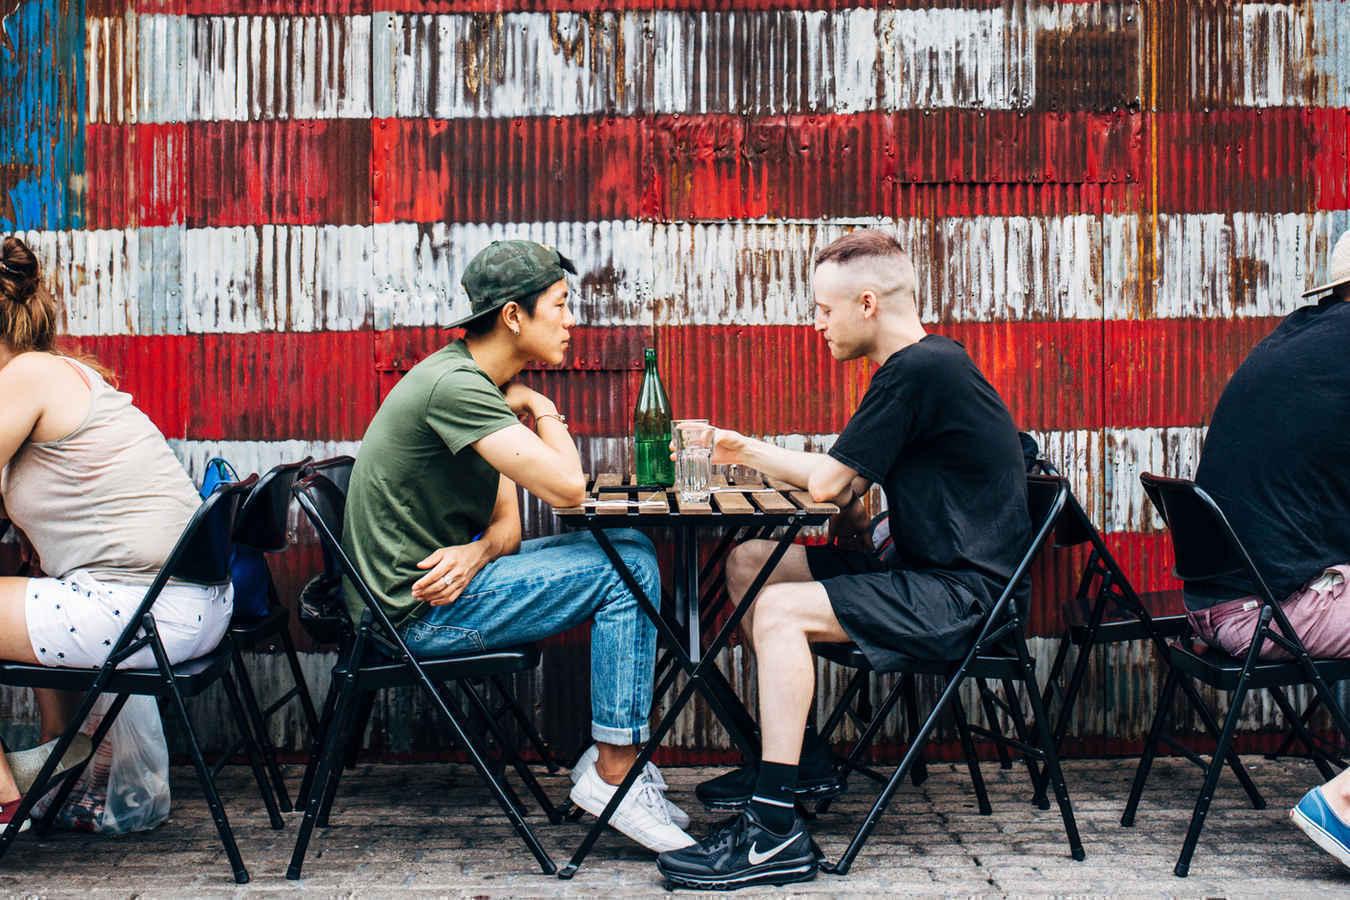 Outdoor cafe in Williamsburg Brooklyn